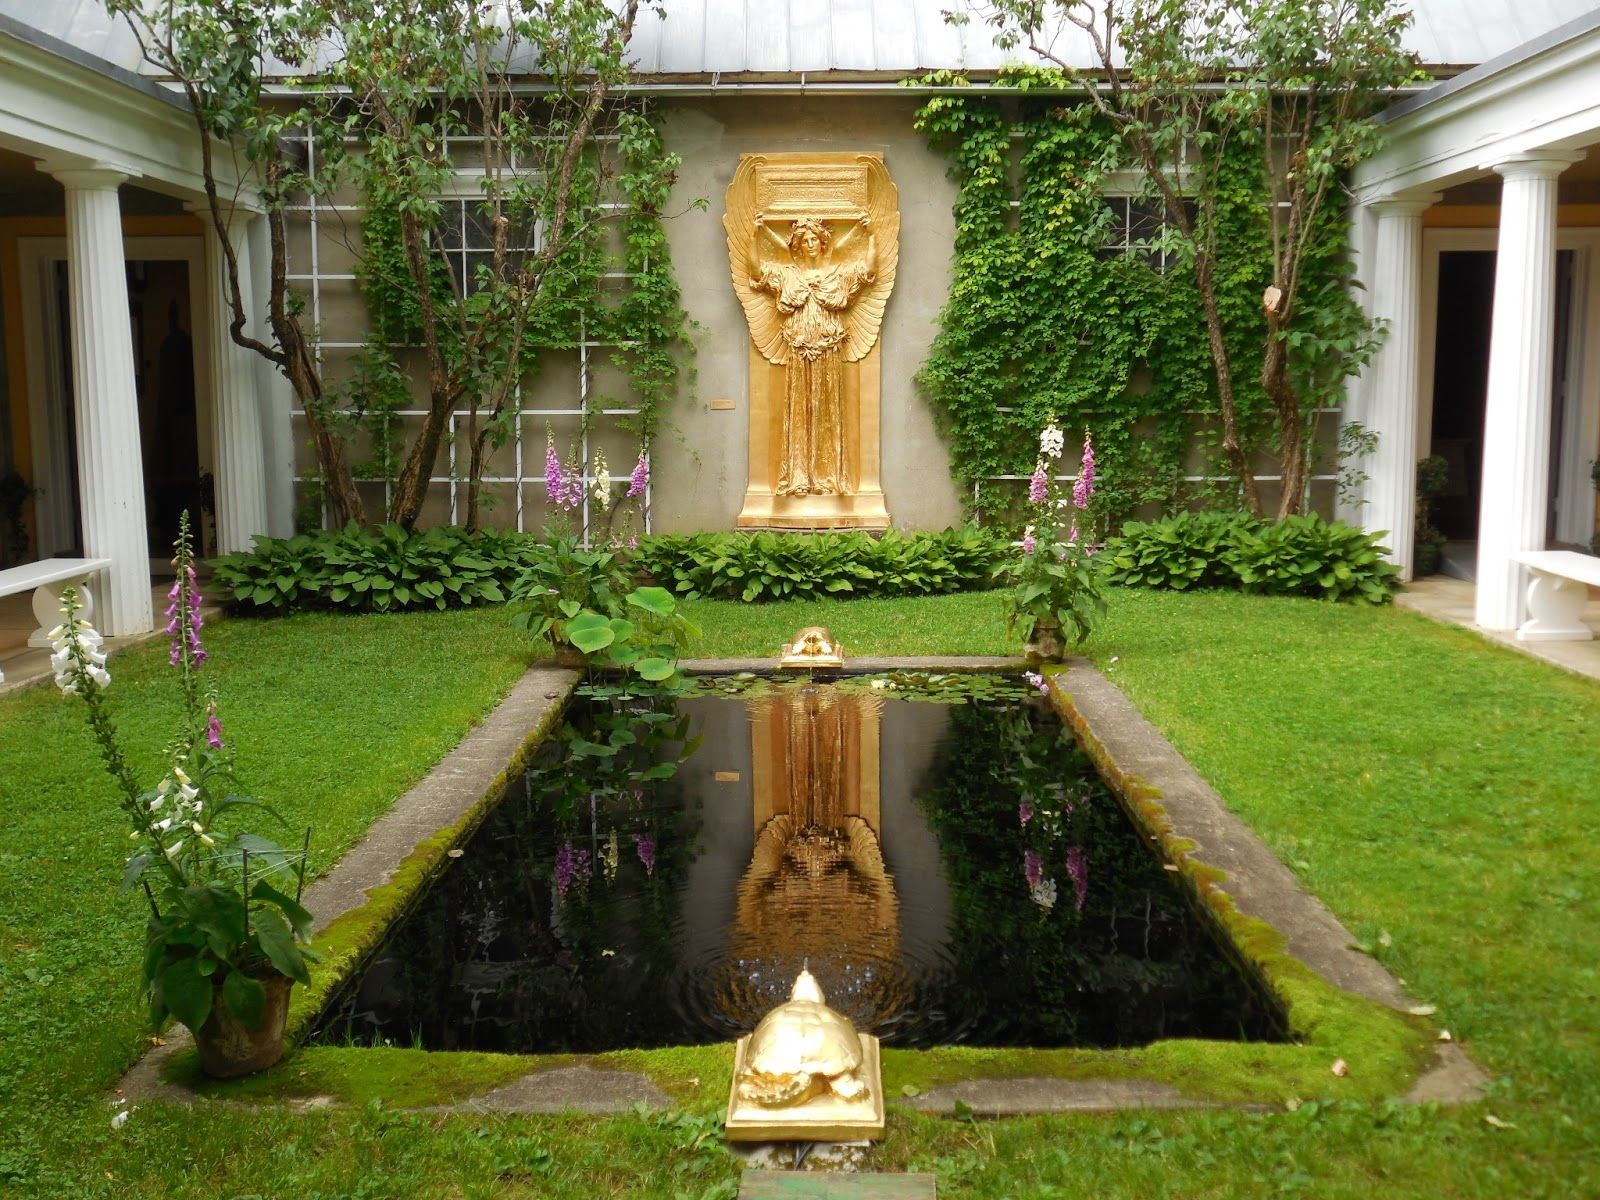 Saint Gaudens Gardens